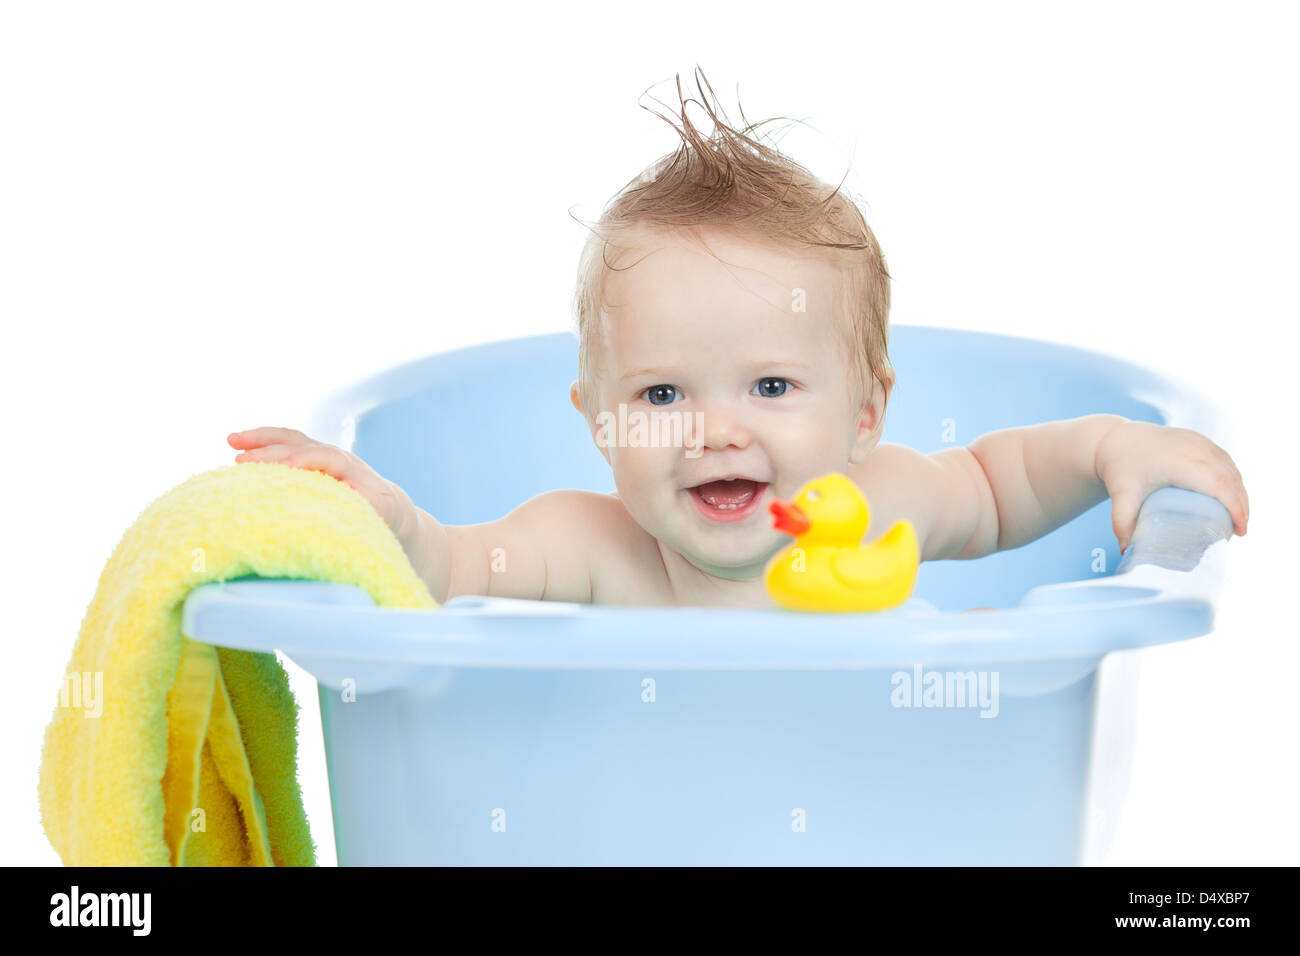 Small Baby Boy Having Bath Stock Photos & Small Baby Boy Having Bath ...